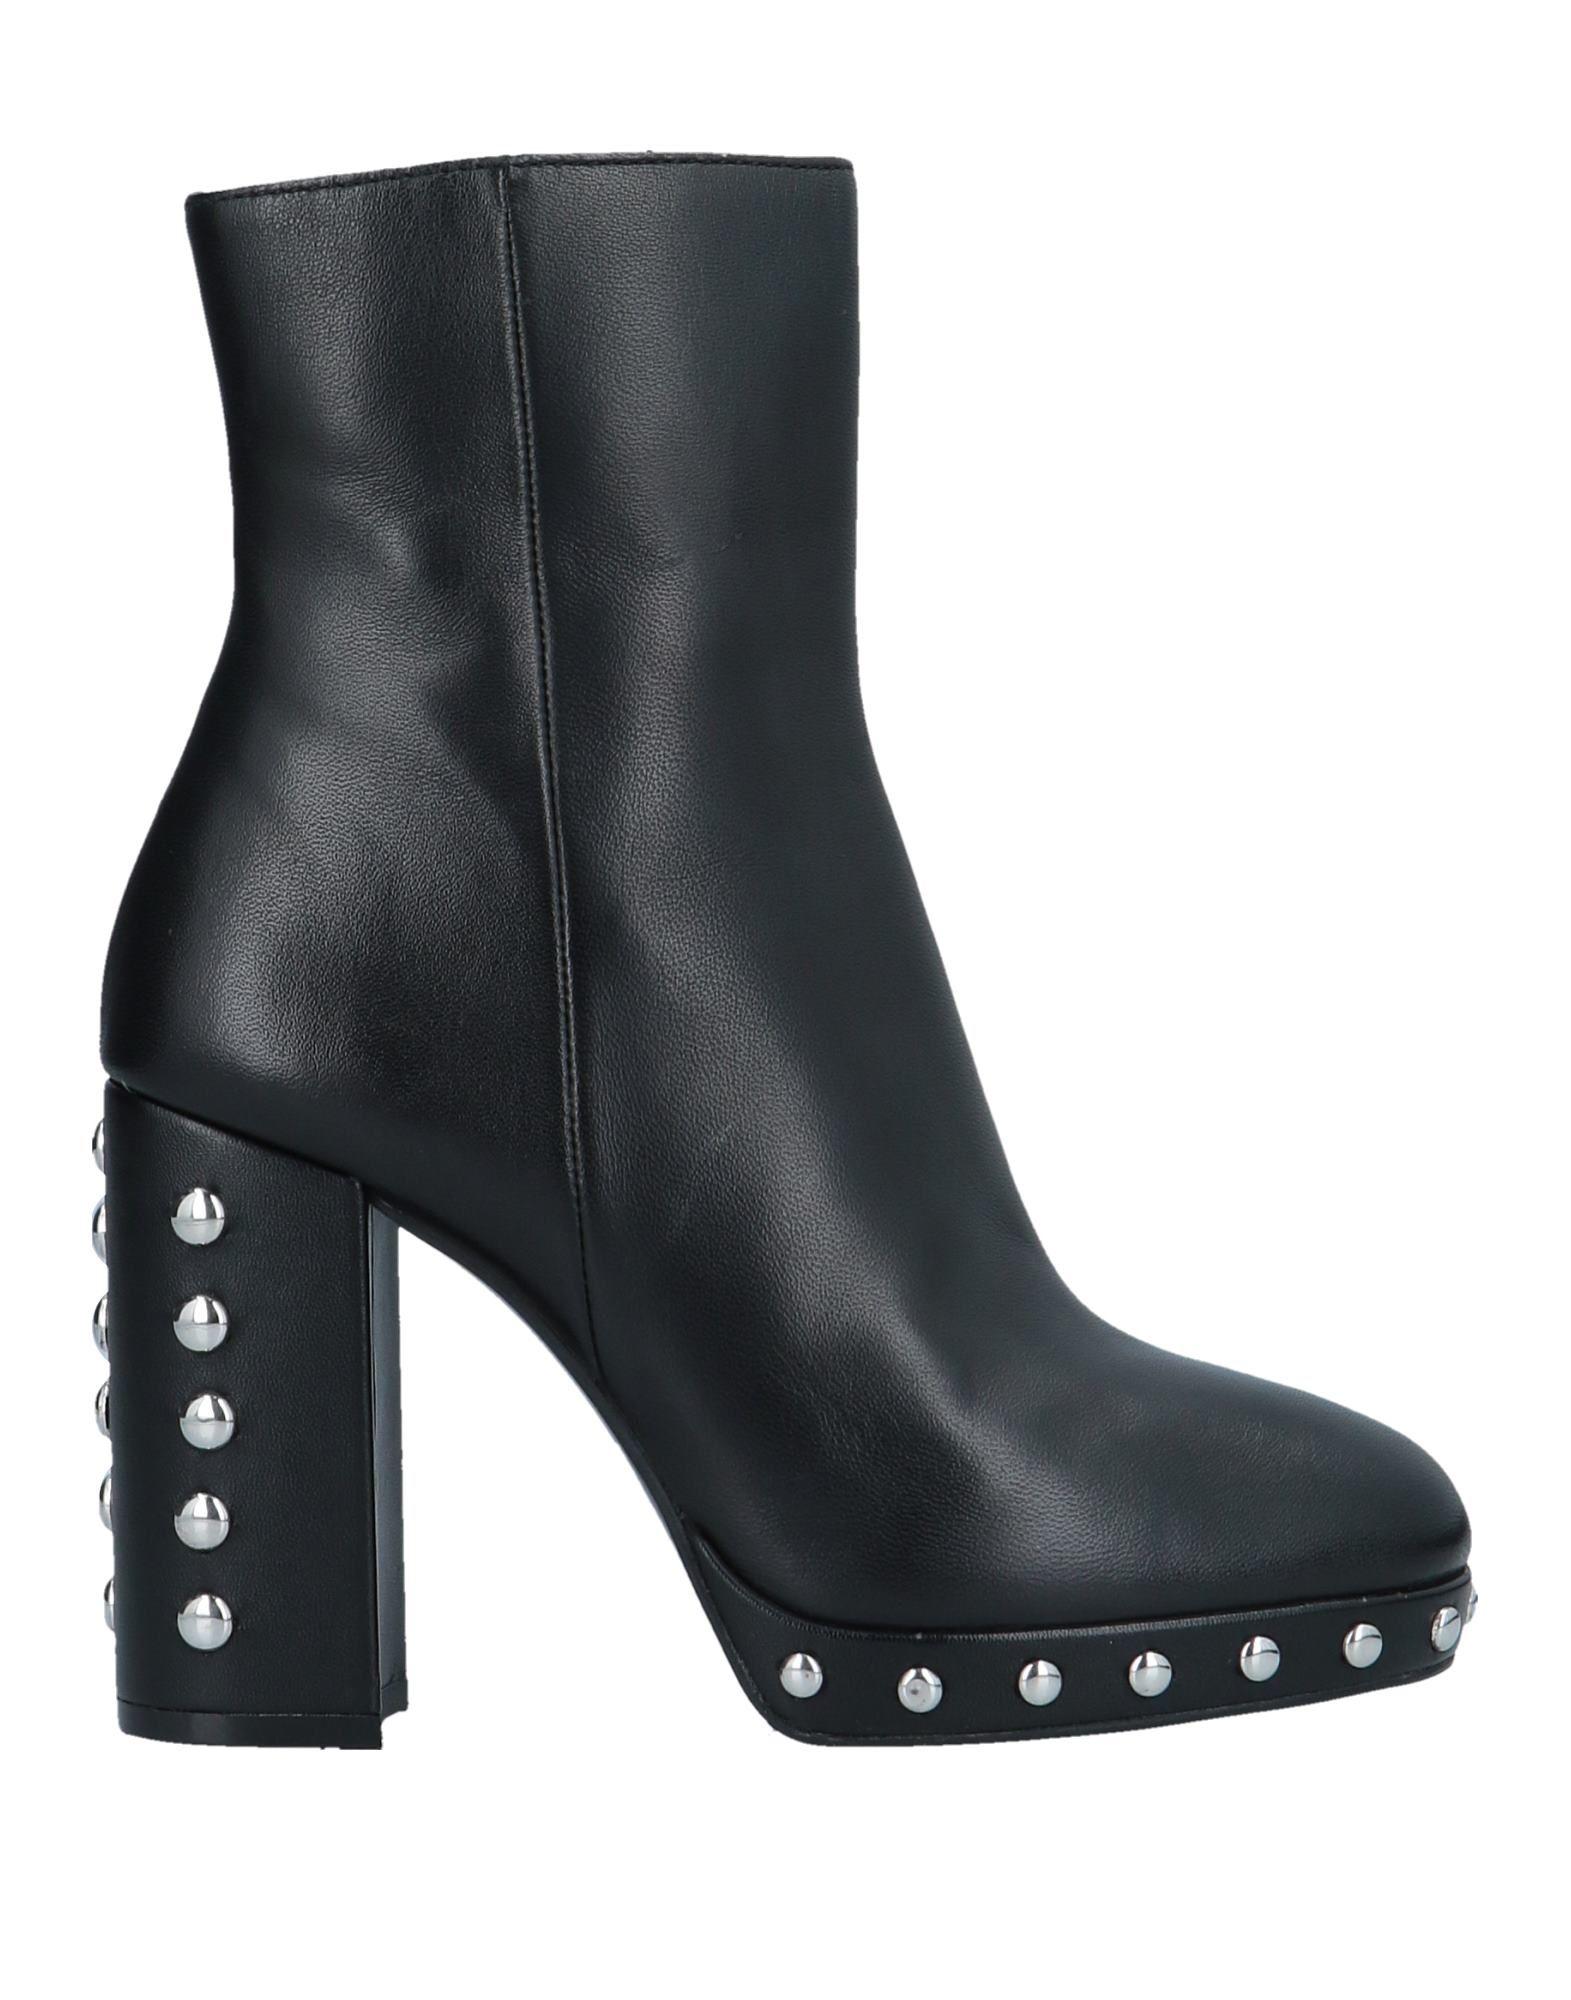 BRUNO PREMI Полусапоги и высокие ботинки bruno bonelli полусапоги и высокие ботинки